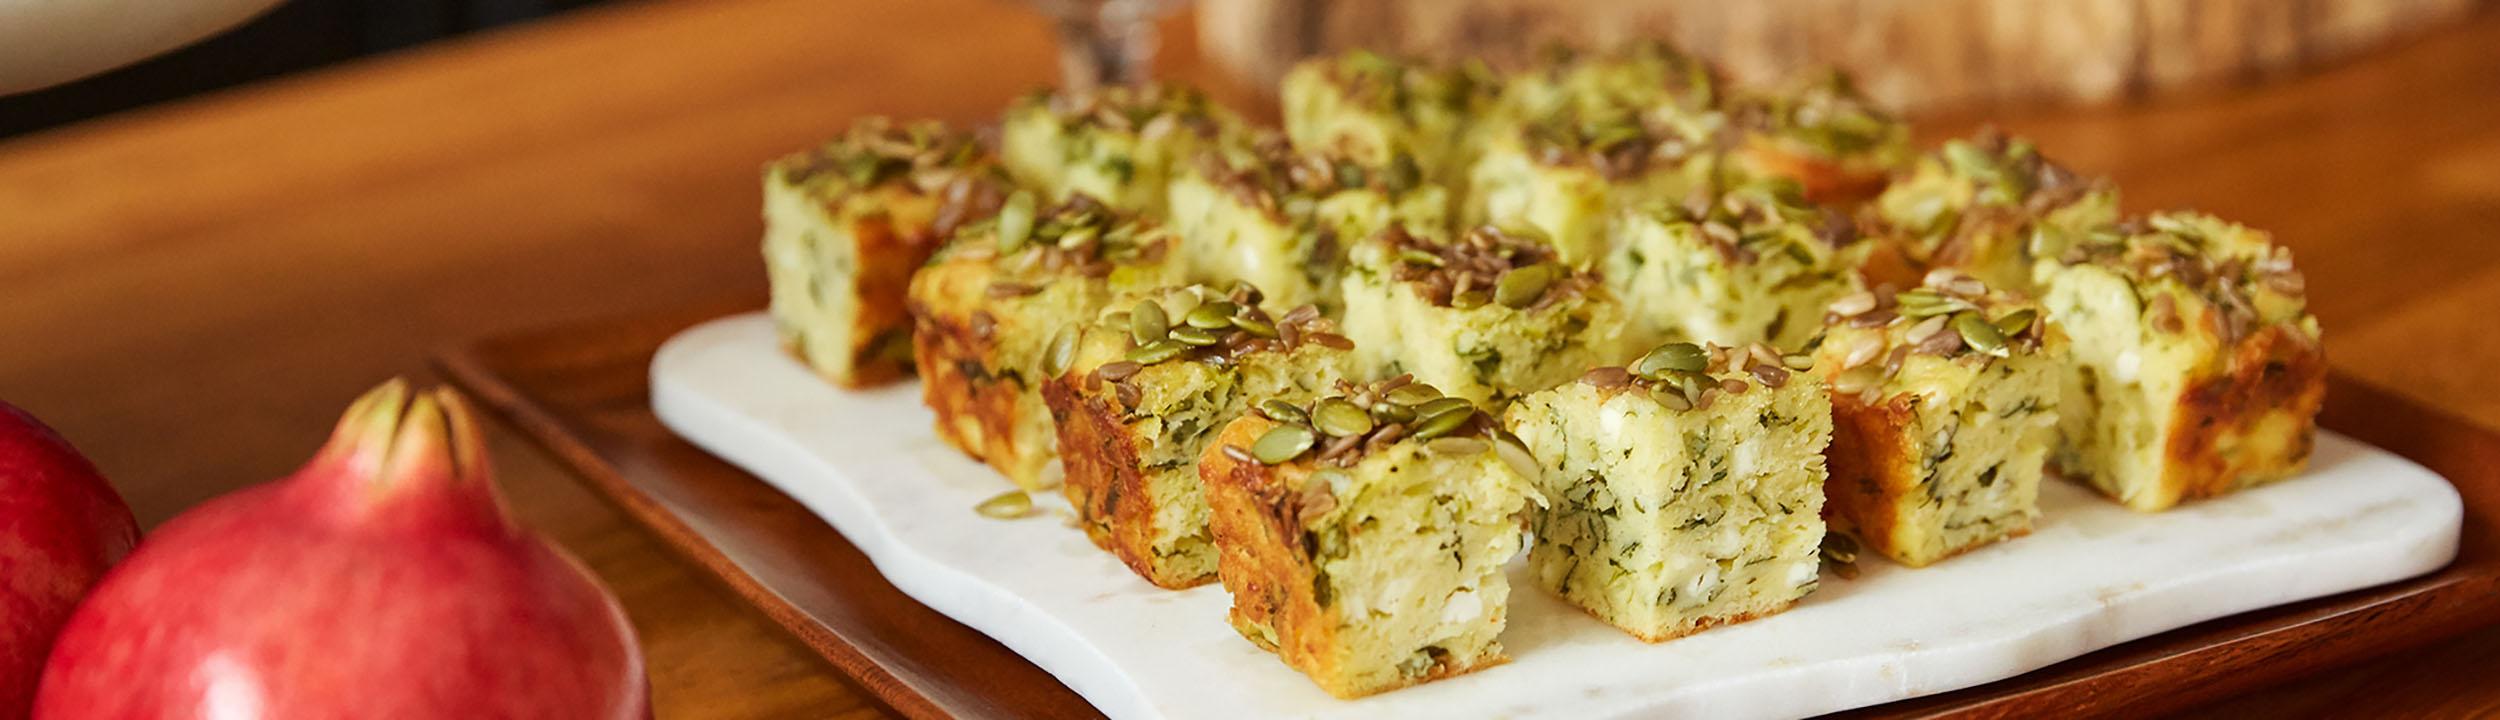 Recette Cake Feta Herbes